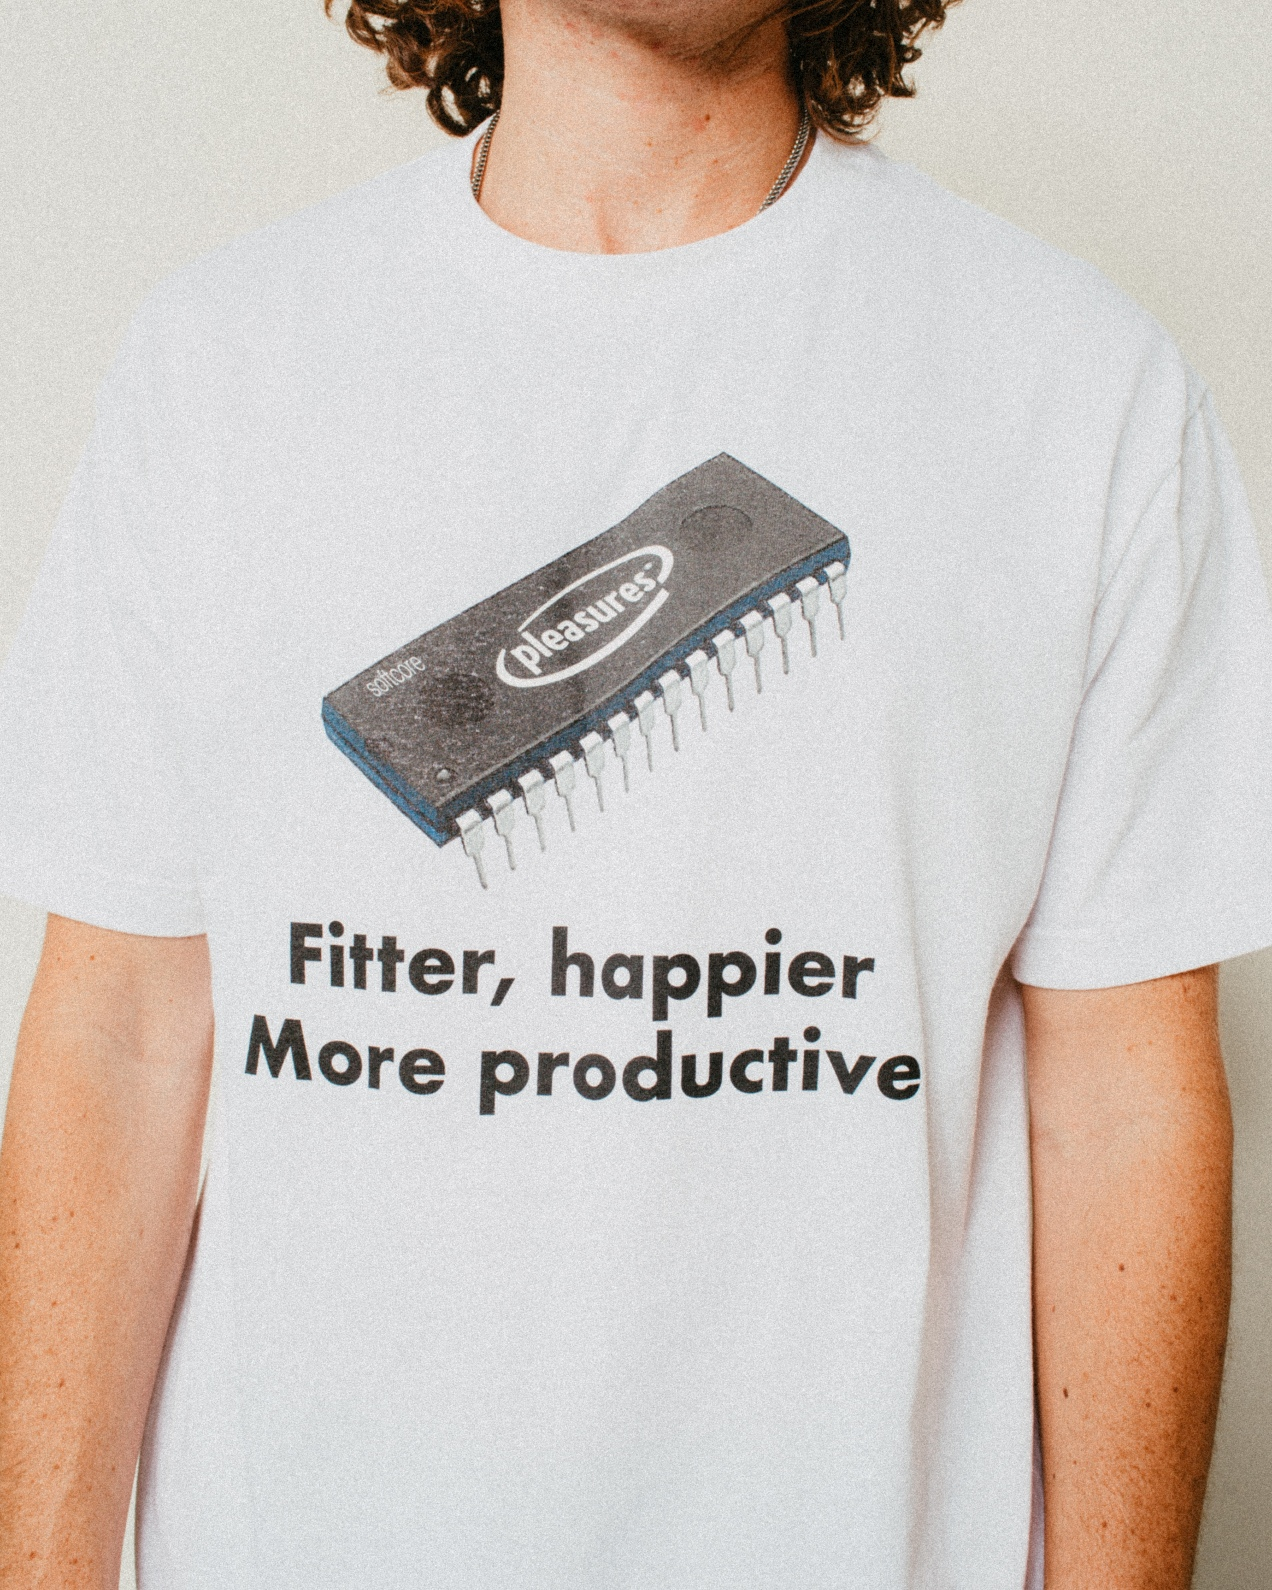 【PLEASURES/プレジャーズ】HAPPIER T-SHIRT Tシャツ / WHITE